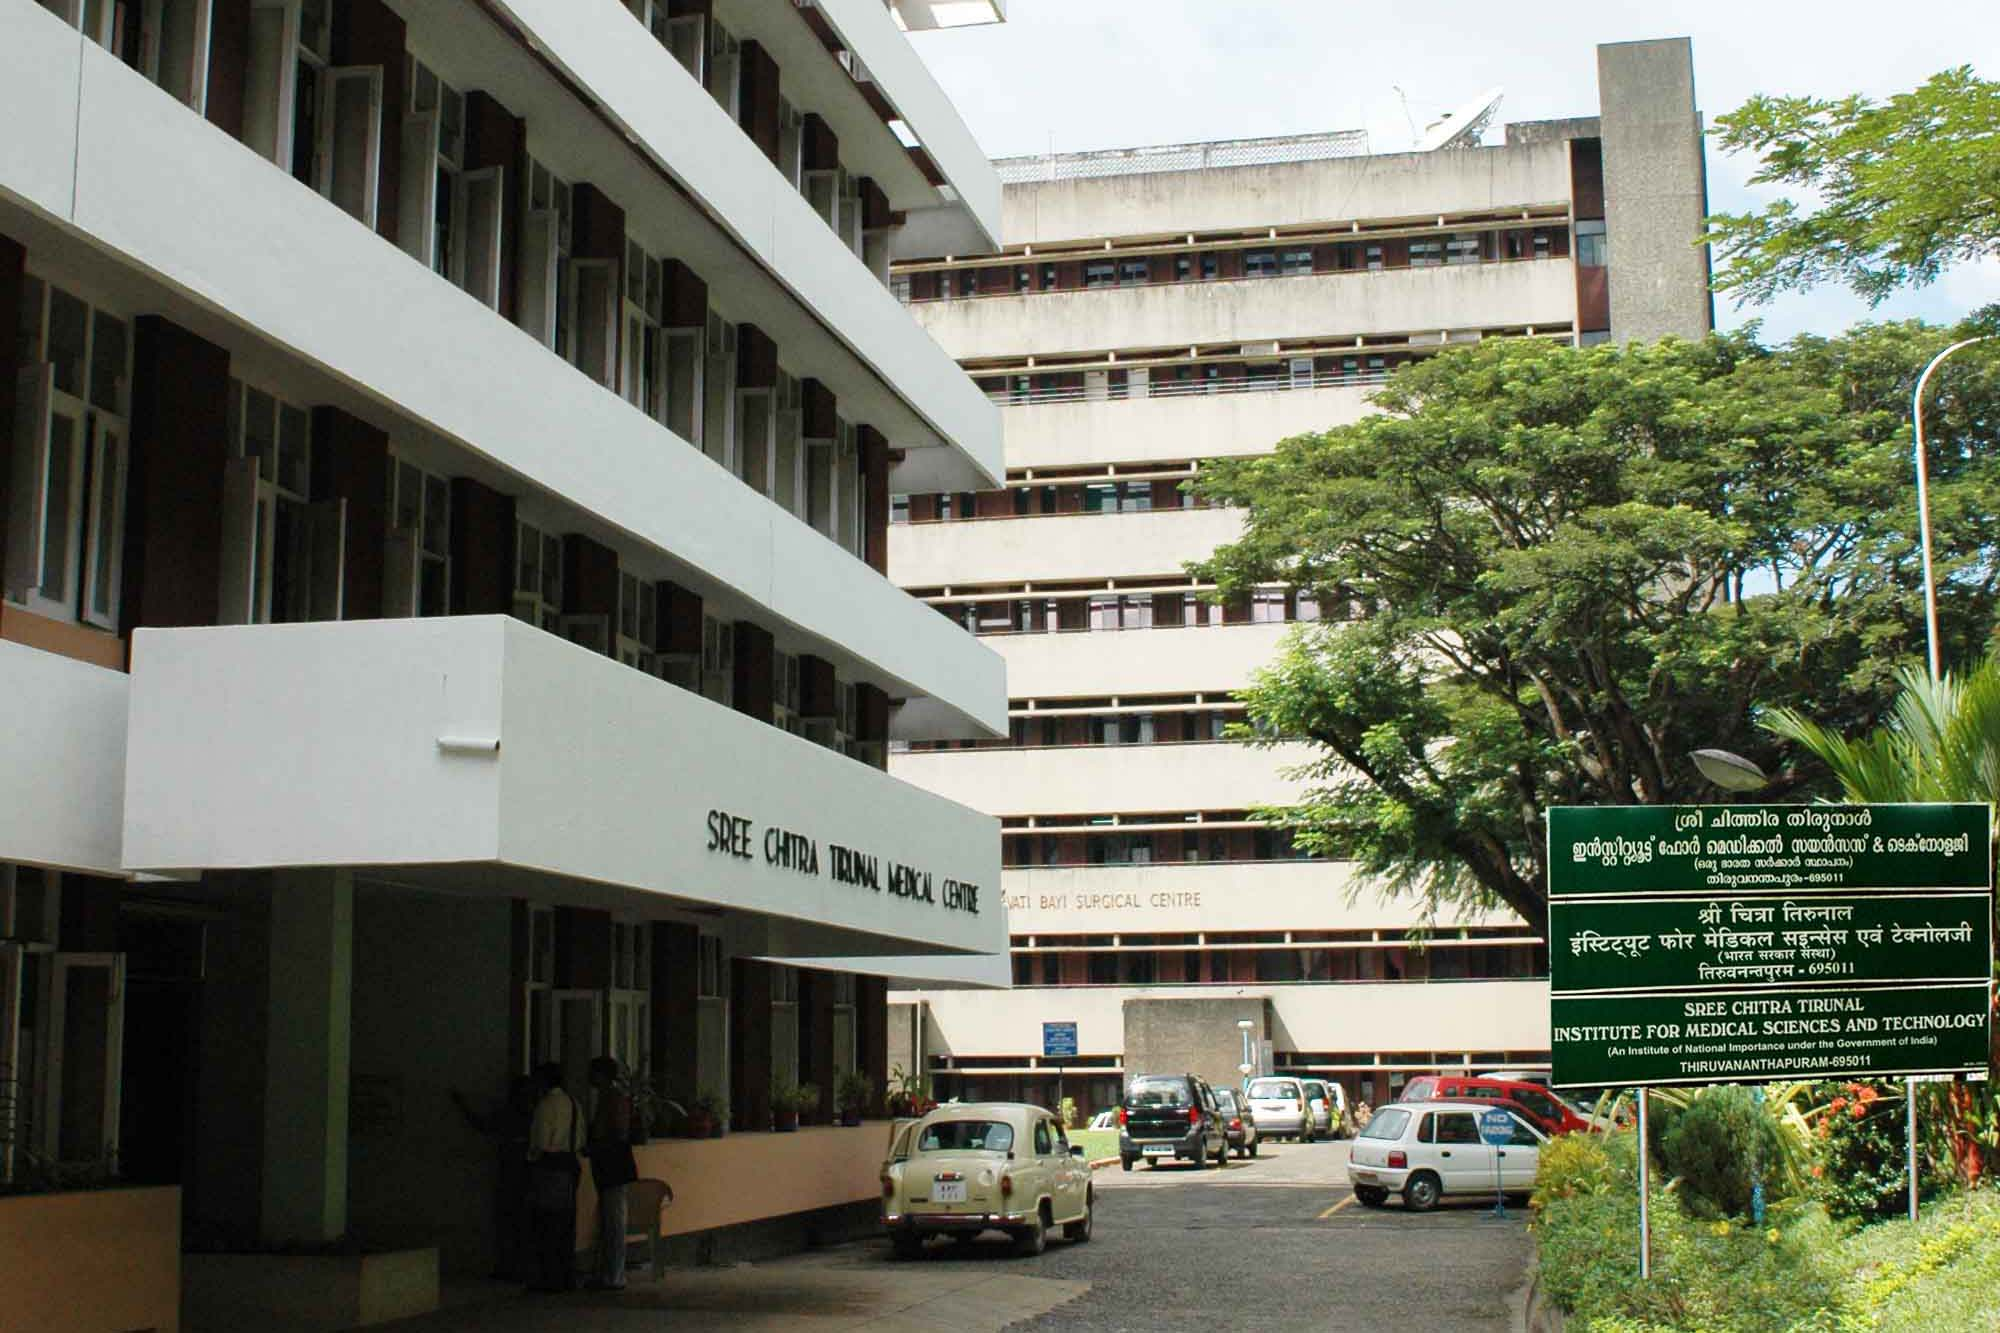 Sree Chitra Thirunal Institute for Medical Science and Technology, Thiruvananthapuram Image